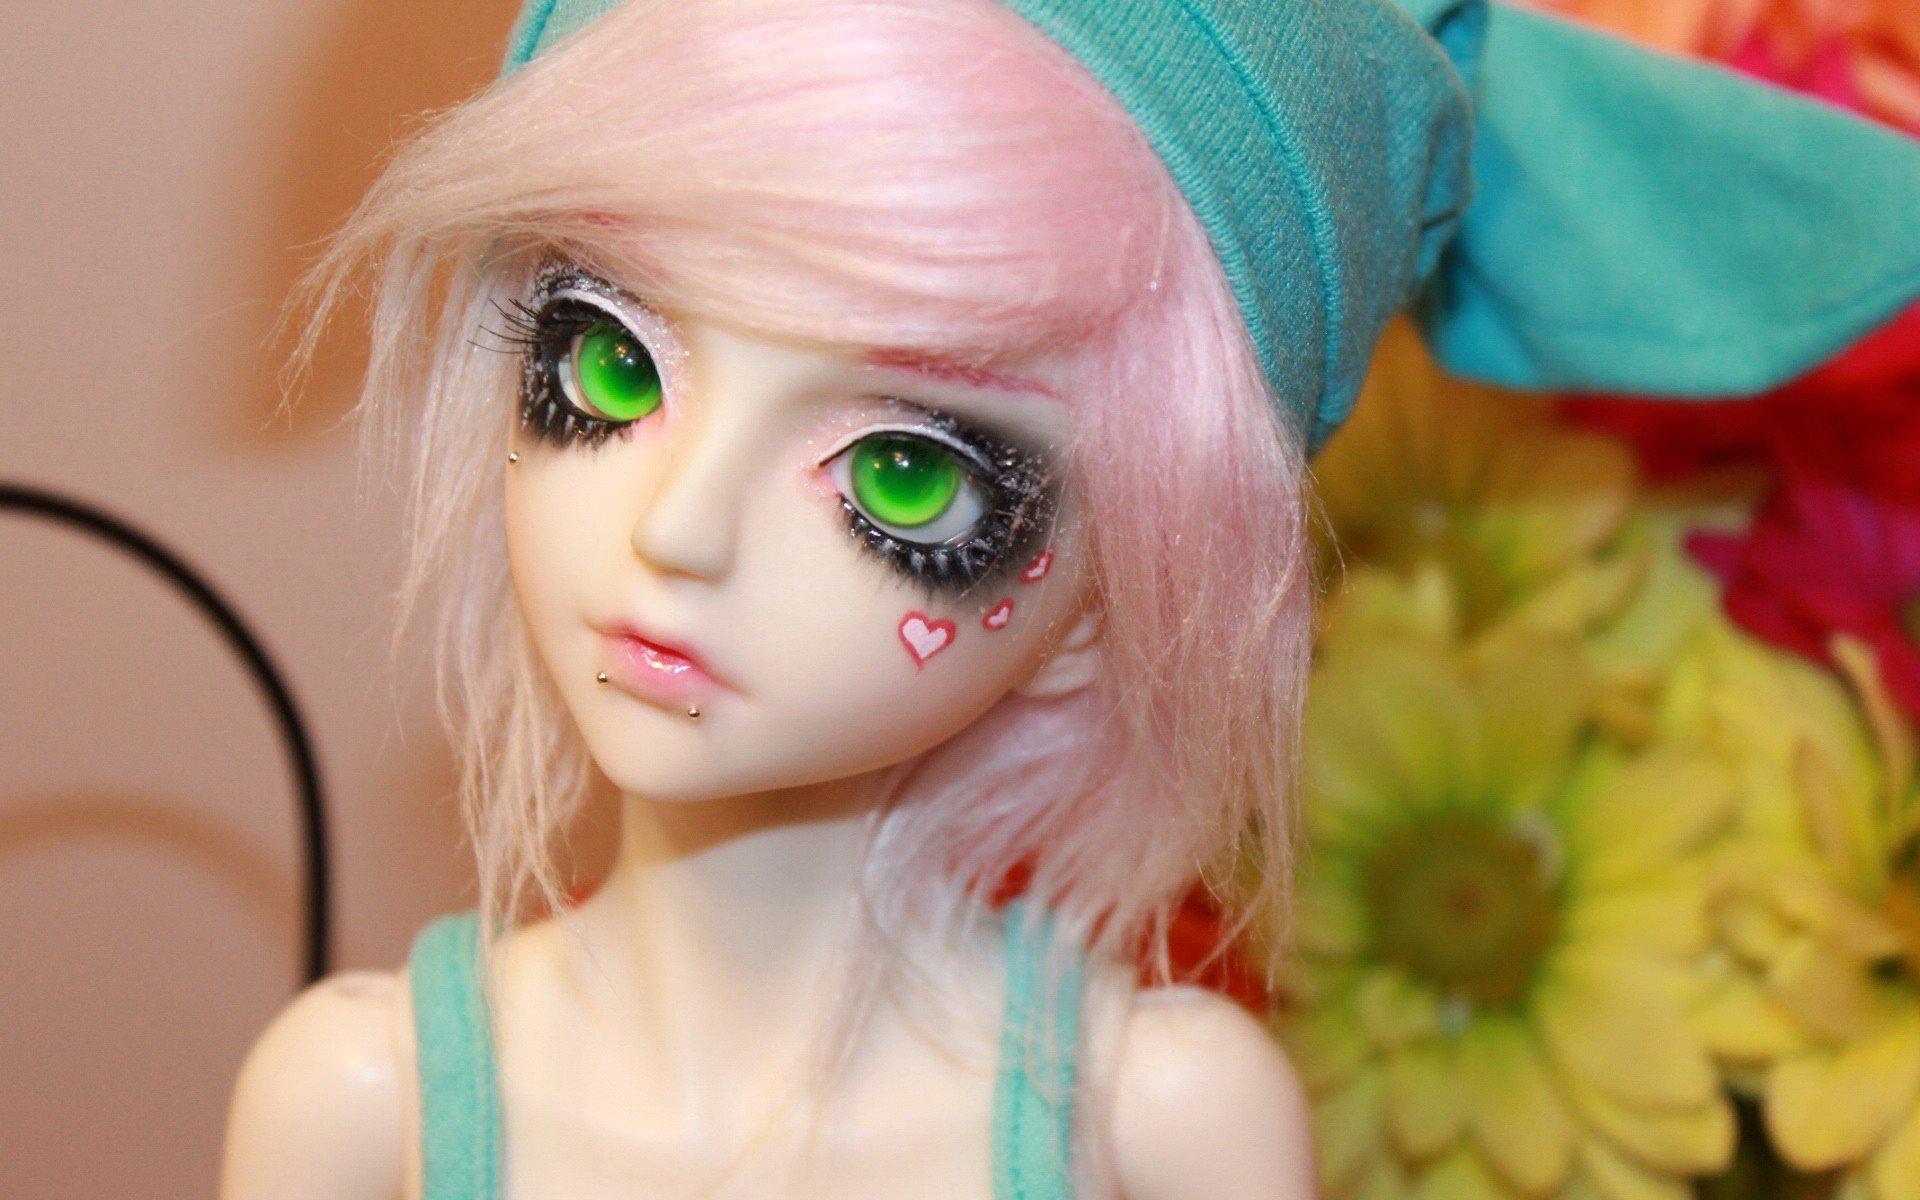 Cute Baby Blue Eyes Wallpaper Bjd Dolls Wallpaper Www Pixshark Com Images Galleries